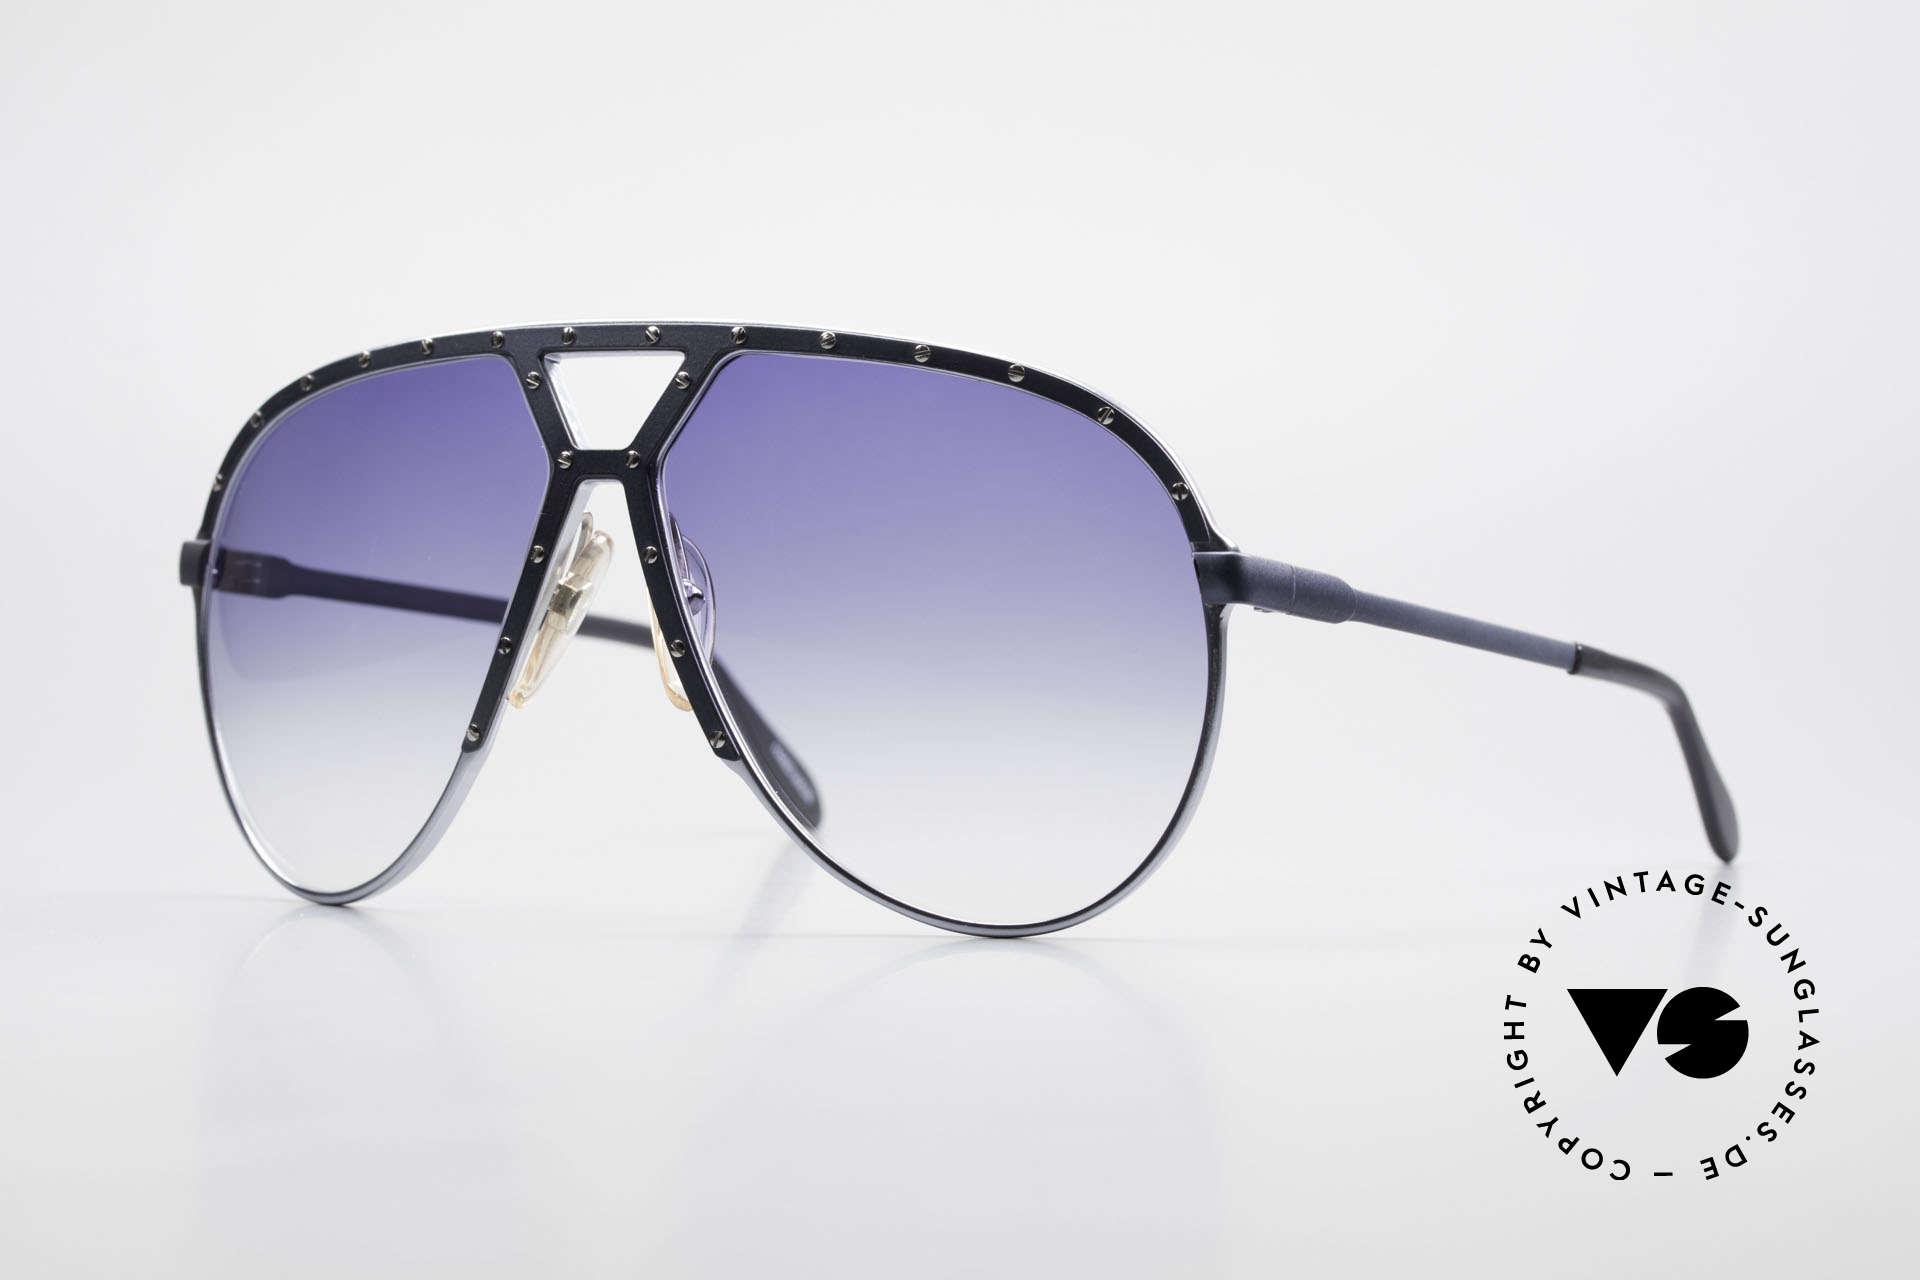 Alpina M1 Extra Large M1 80's Sunglasses, extra large 80's Alpina sunglasses, famous model M1, Made for Men